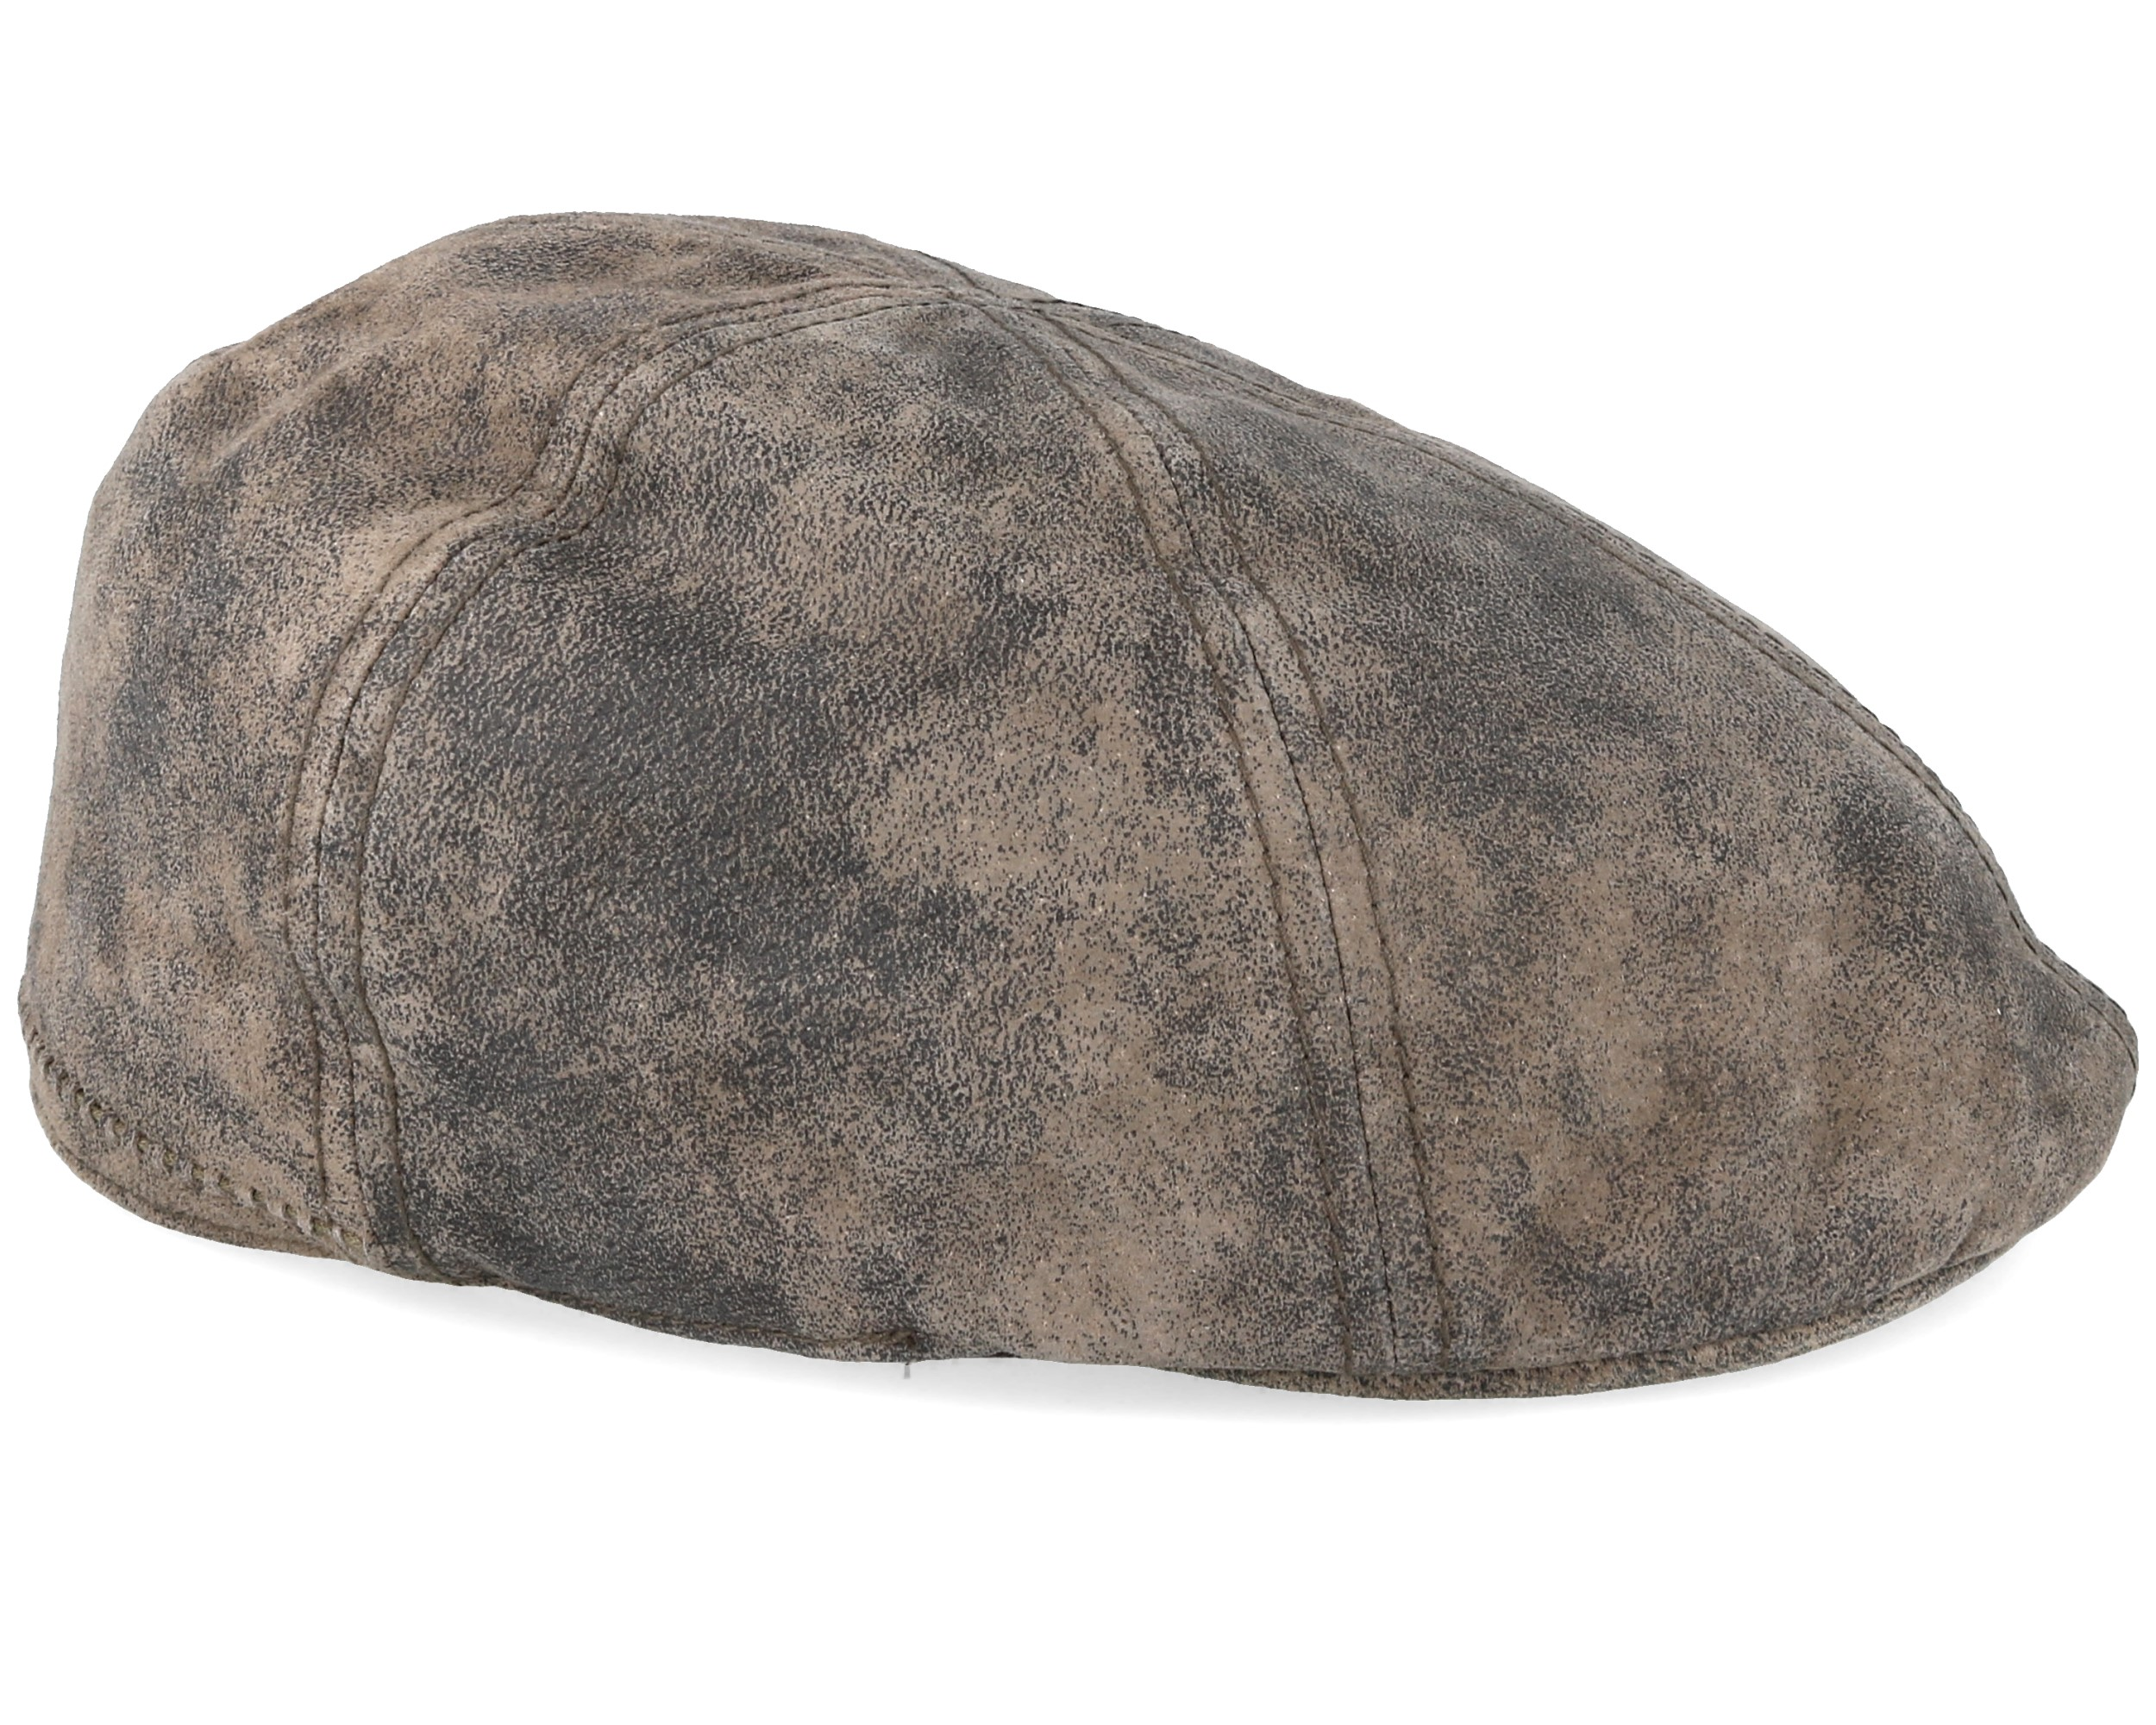 Texas Pig Skin Sportcap Flat Cap Stetson Cap Hatstore De